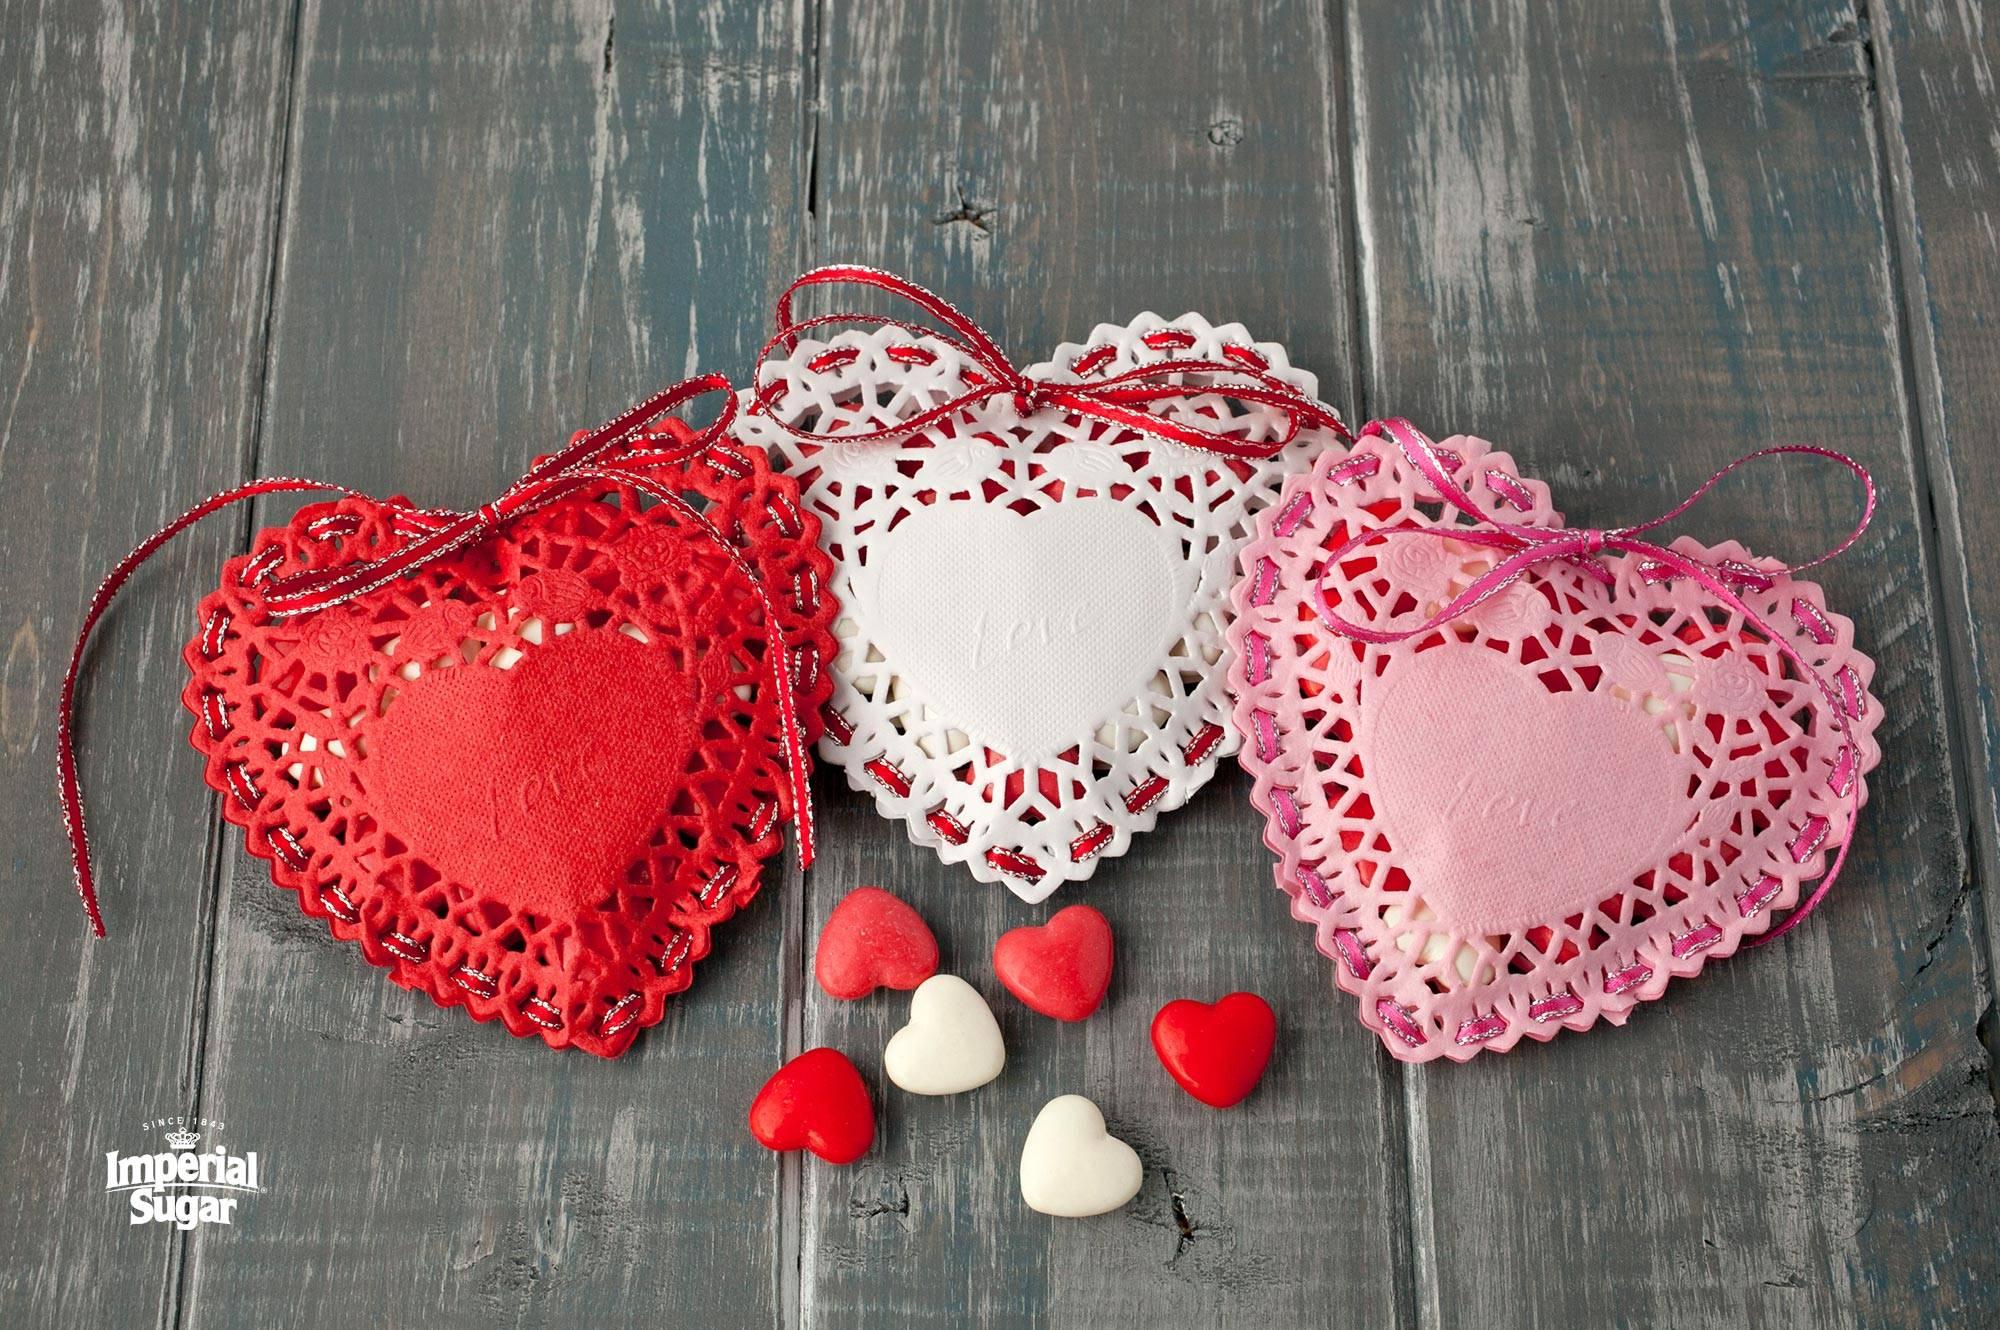 Doily Candy Hearts